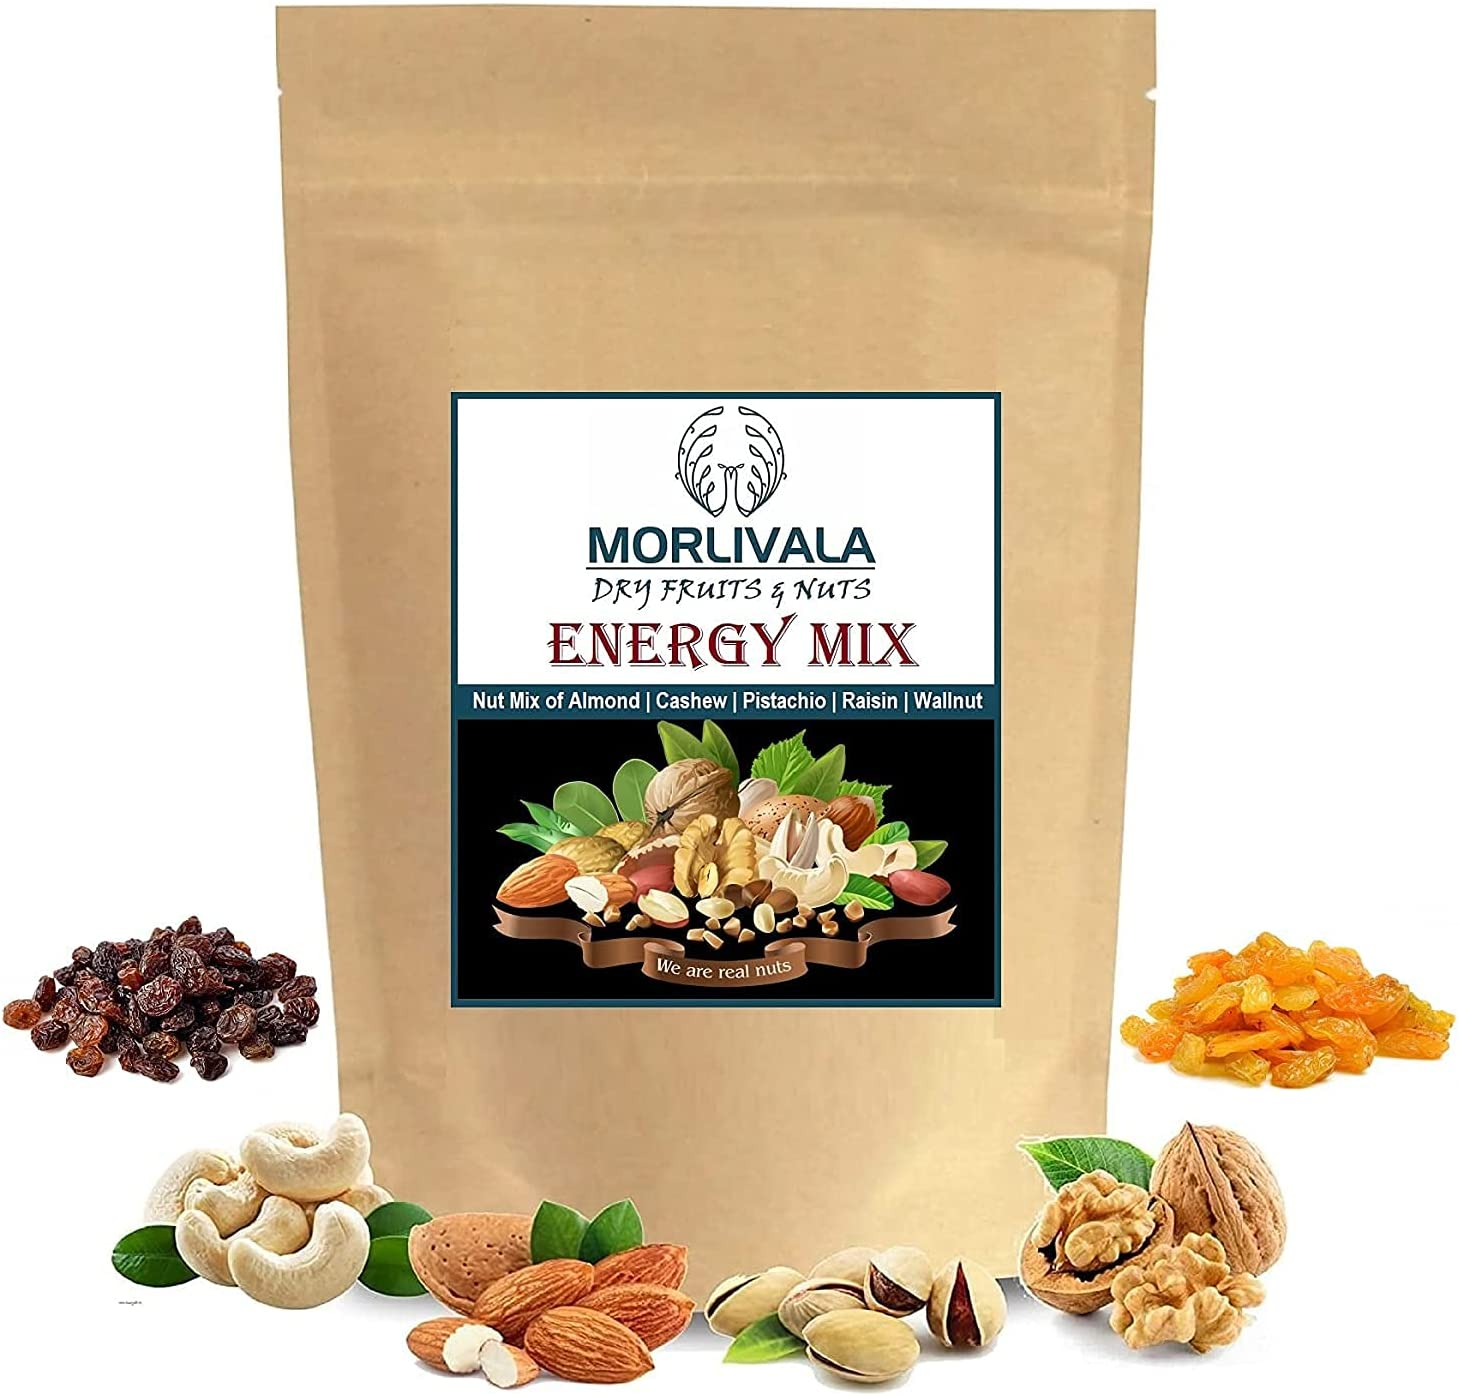 Gannon Morlivala OFFicial site 100% Natural Classic Premium Nut Mix Healthy Fresh Dr